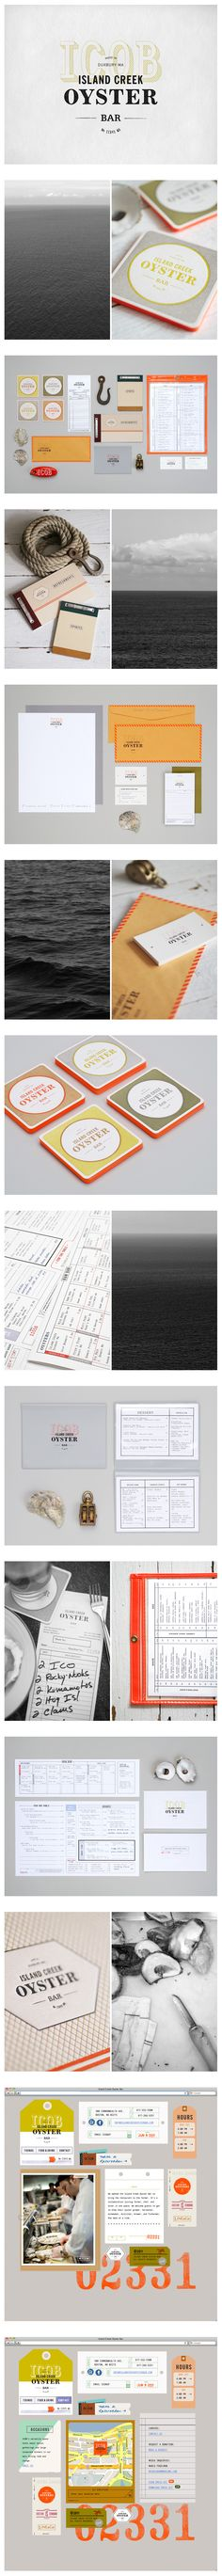 logo, identity branding, brand identity, ident brand, oyster bar, island creek, design, oat, creek oyster